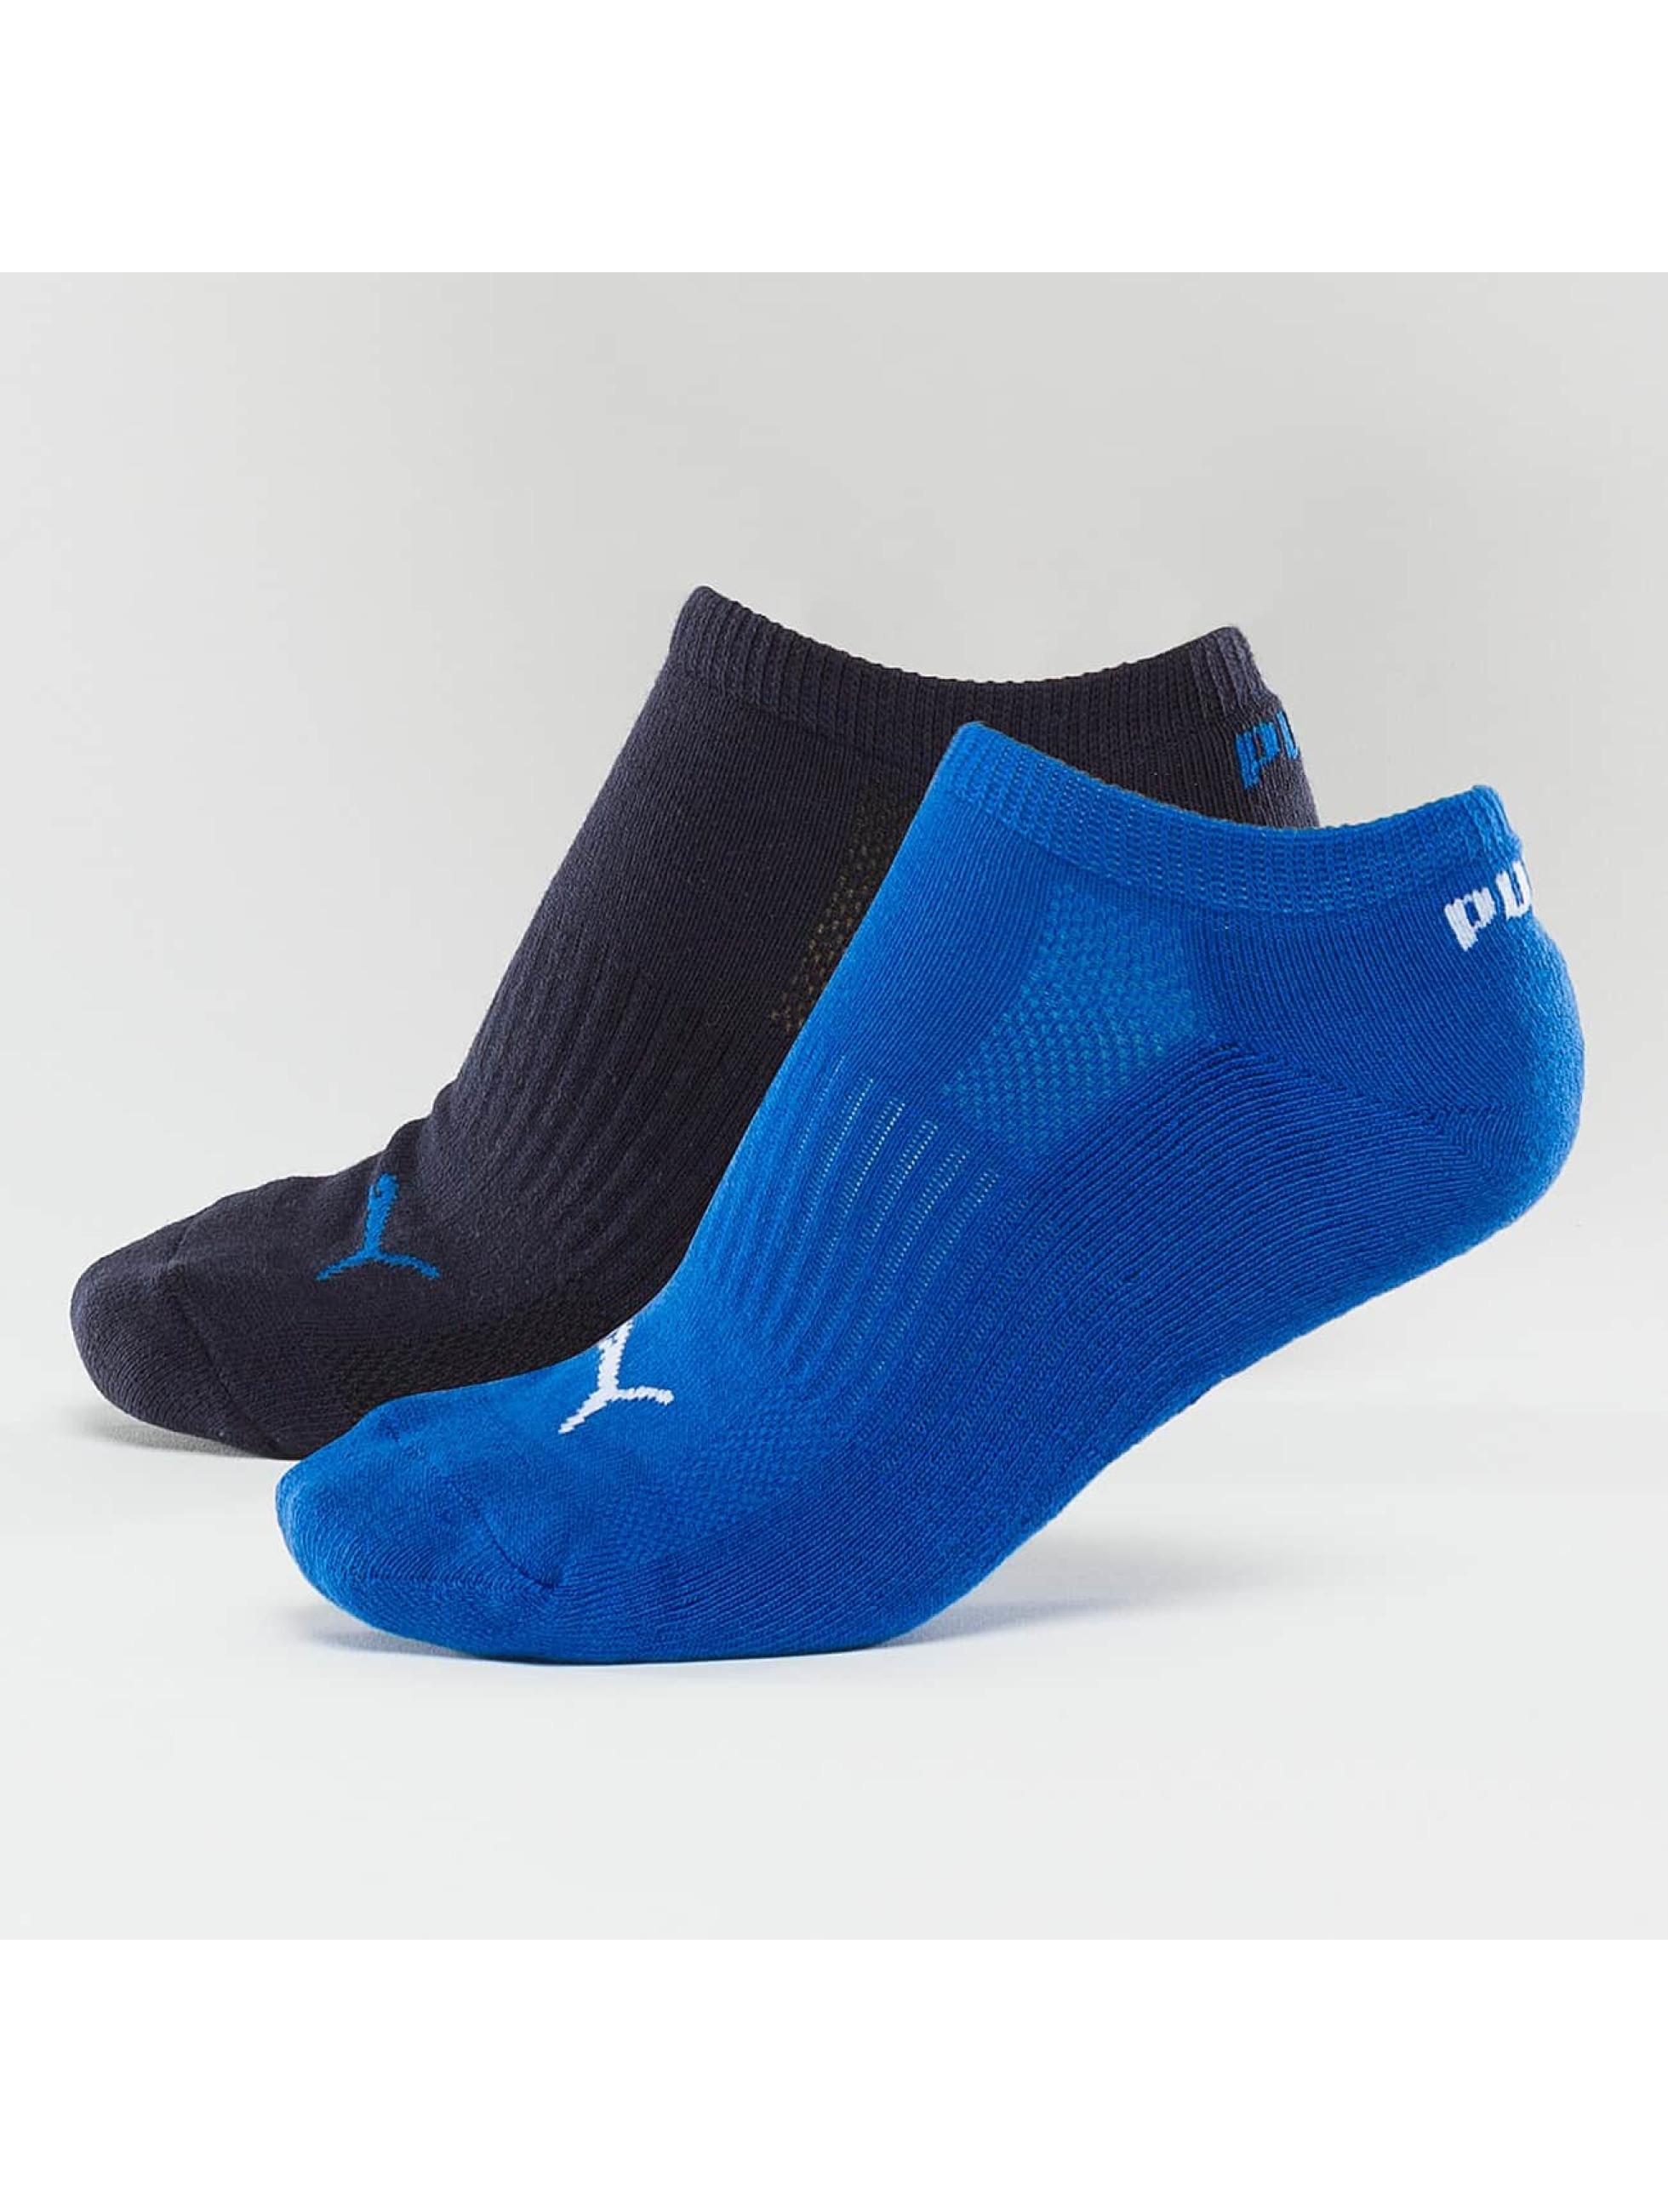 Puma Chaussettes 2-Pack Cushioned bleu